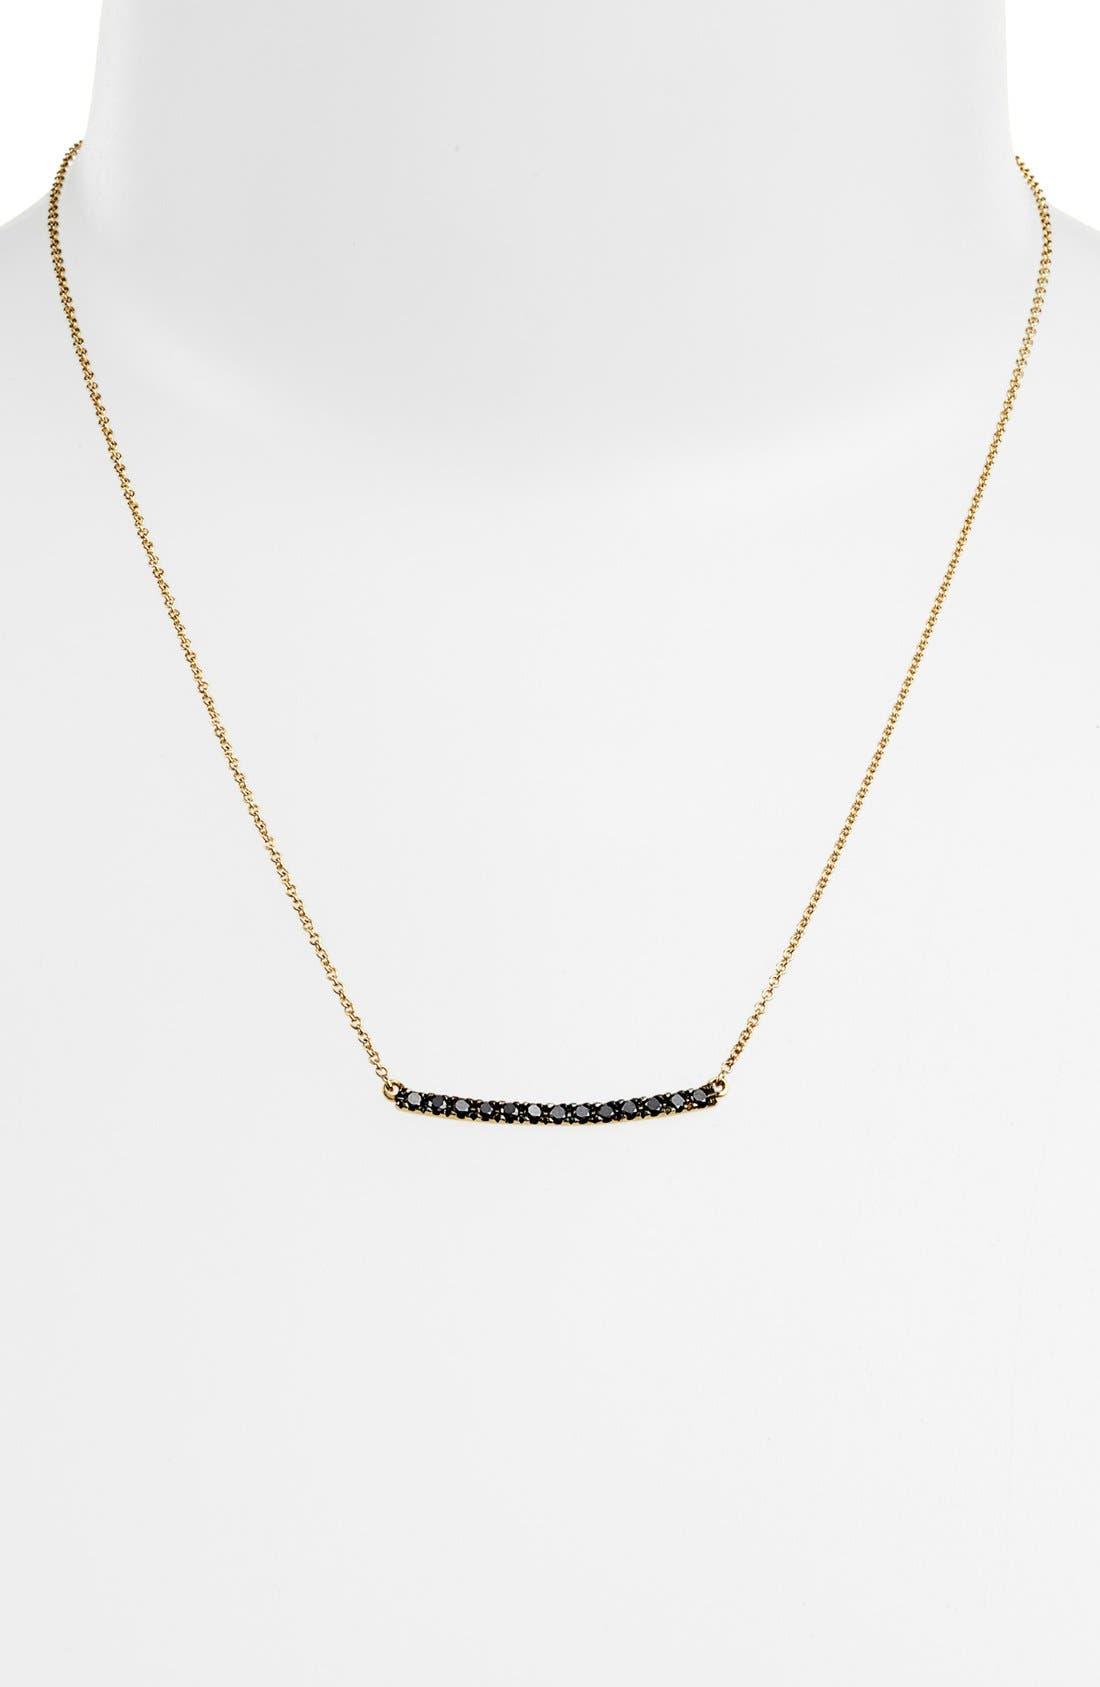 Alternate Image 2  - Bony Levy 'Stick' Pavé Black Diamond Bar Necklace (Nordstrom Exclusive)